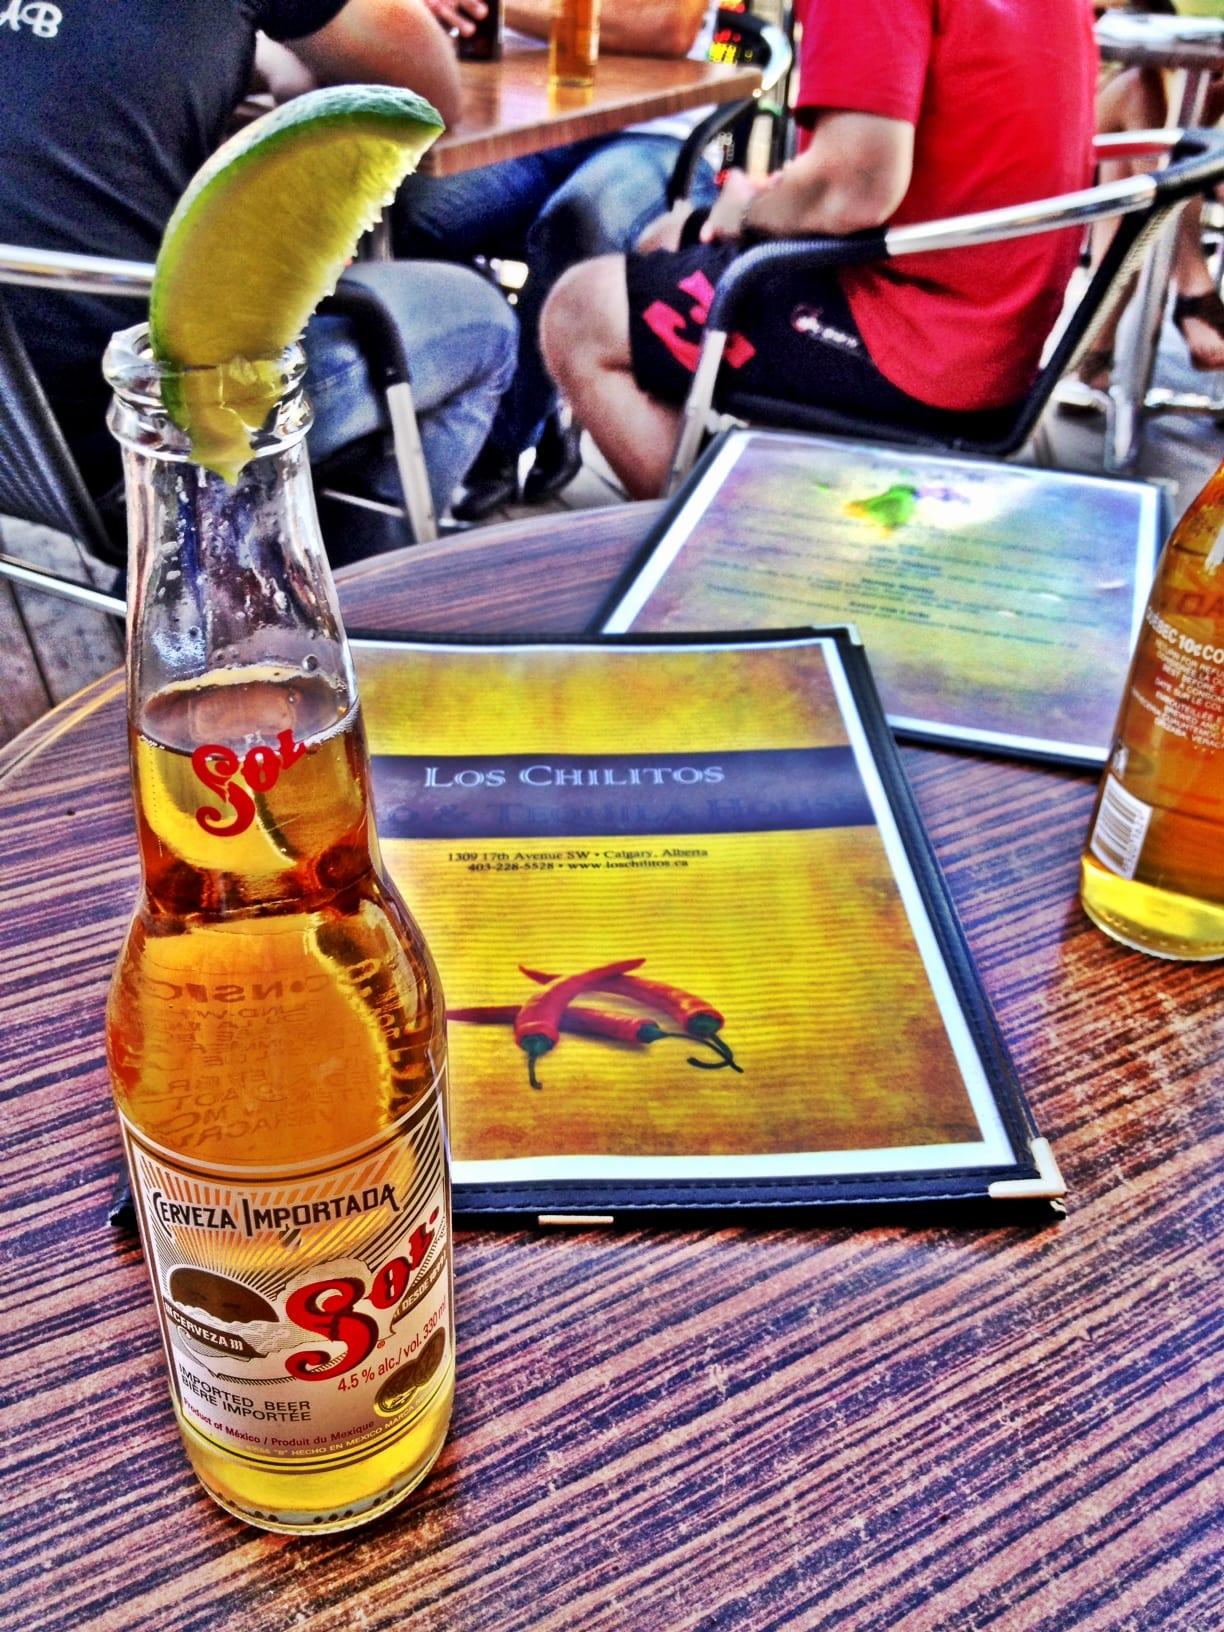 Los Chilitos Calgary Restaurant Photo 1